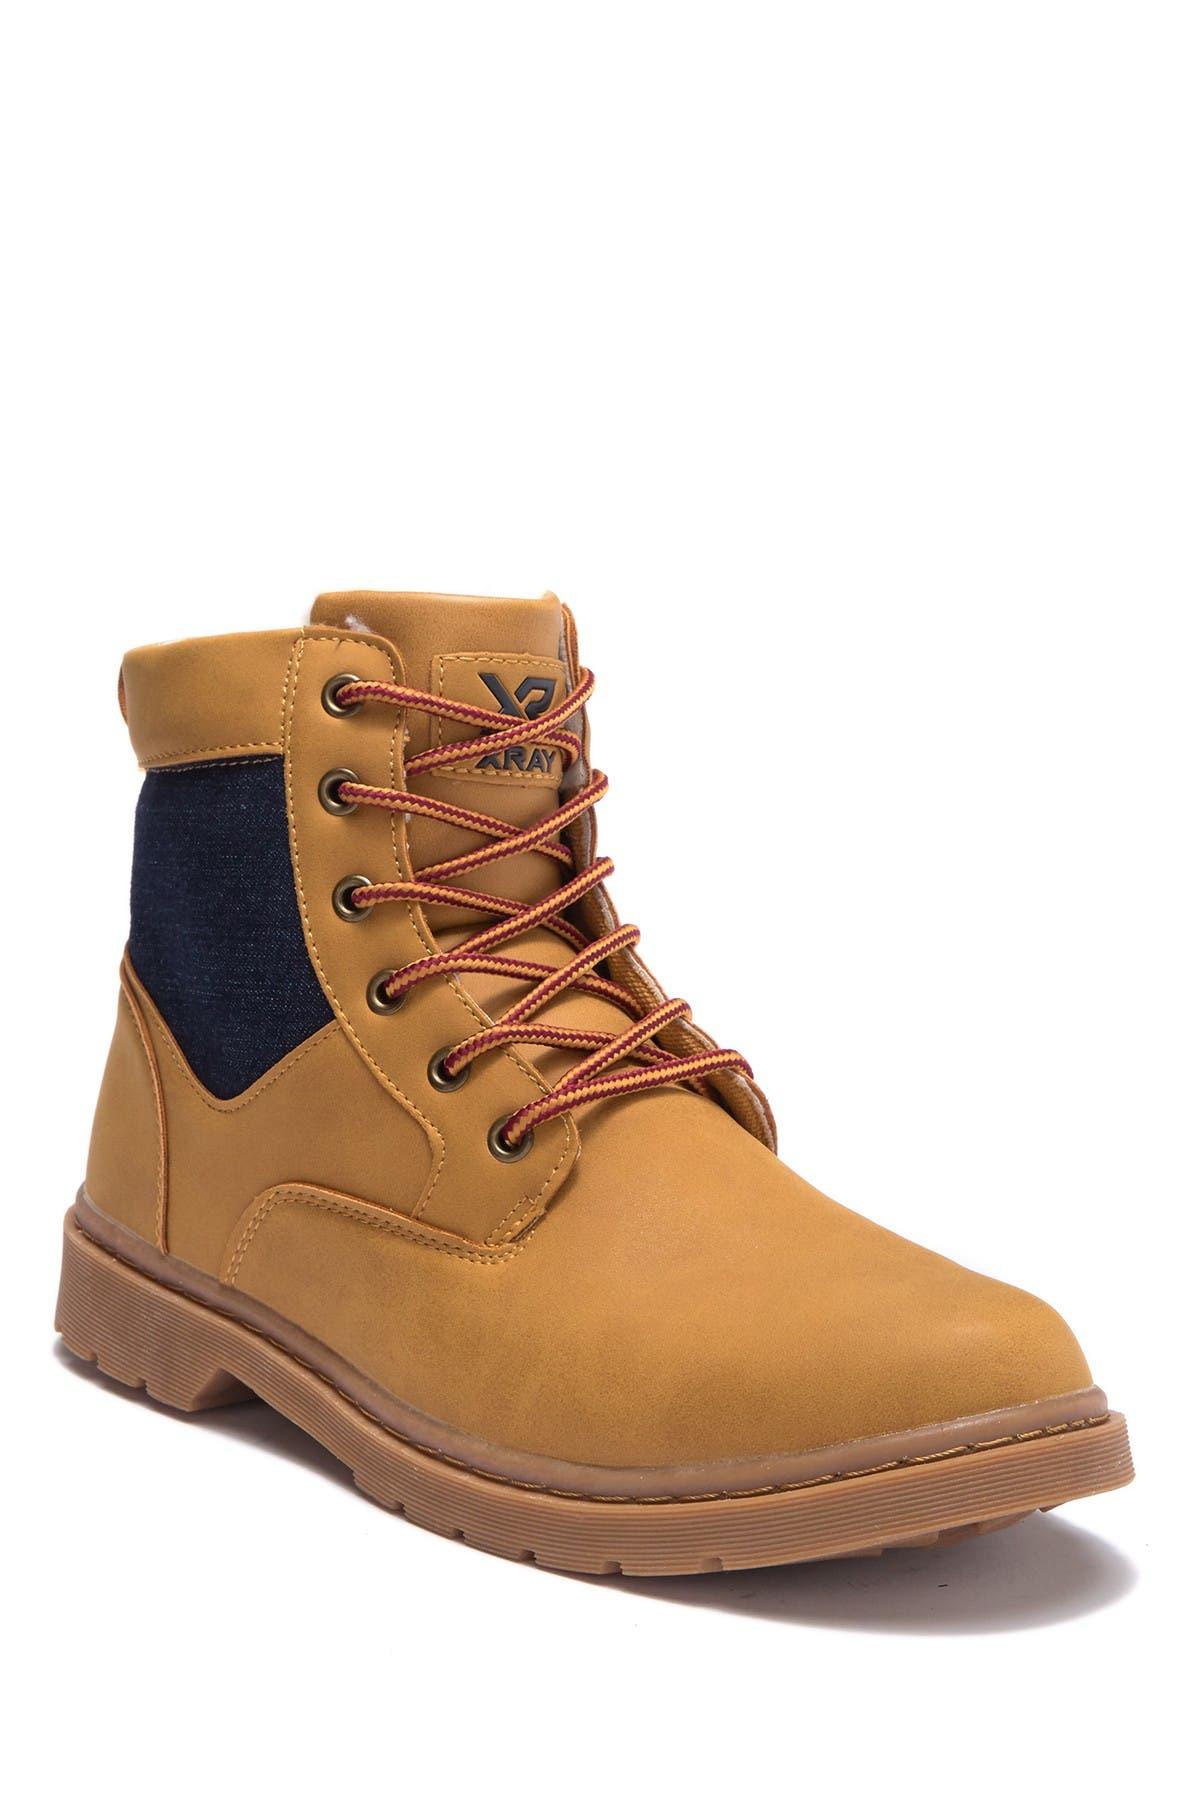 Image of XRAY Fira High Top Boot